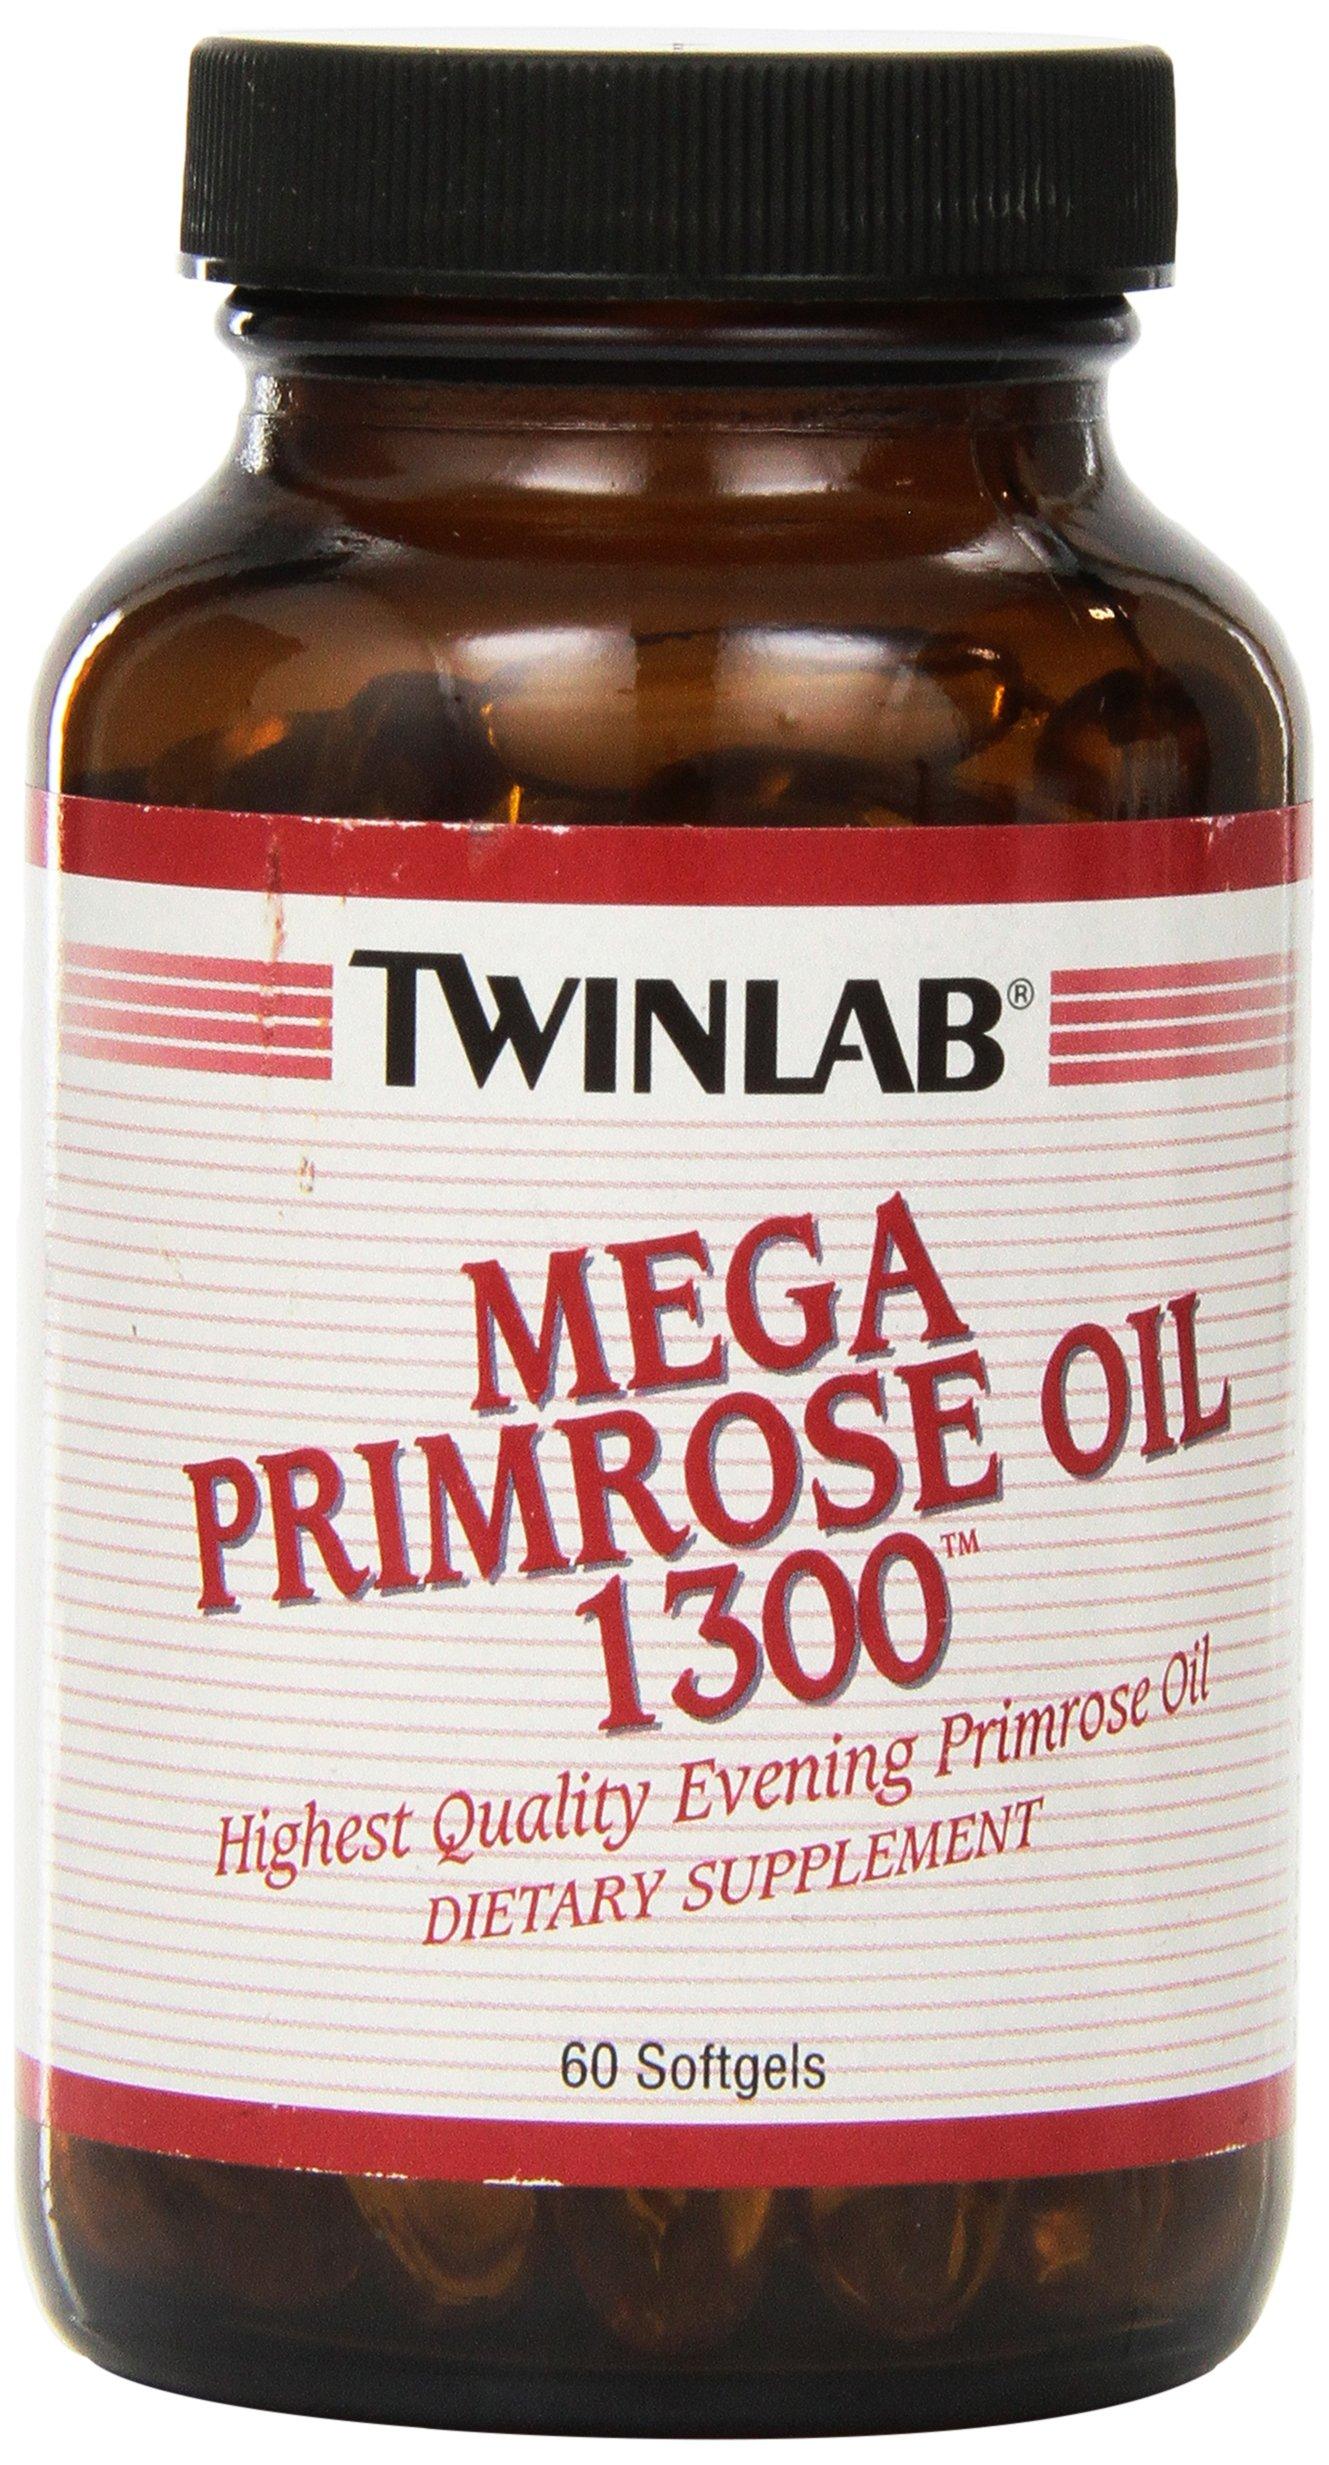 Twinlab Mega Primrose Oil 1300, 60 Softgels (Pack of 2)